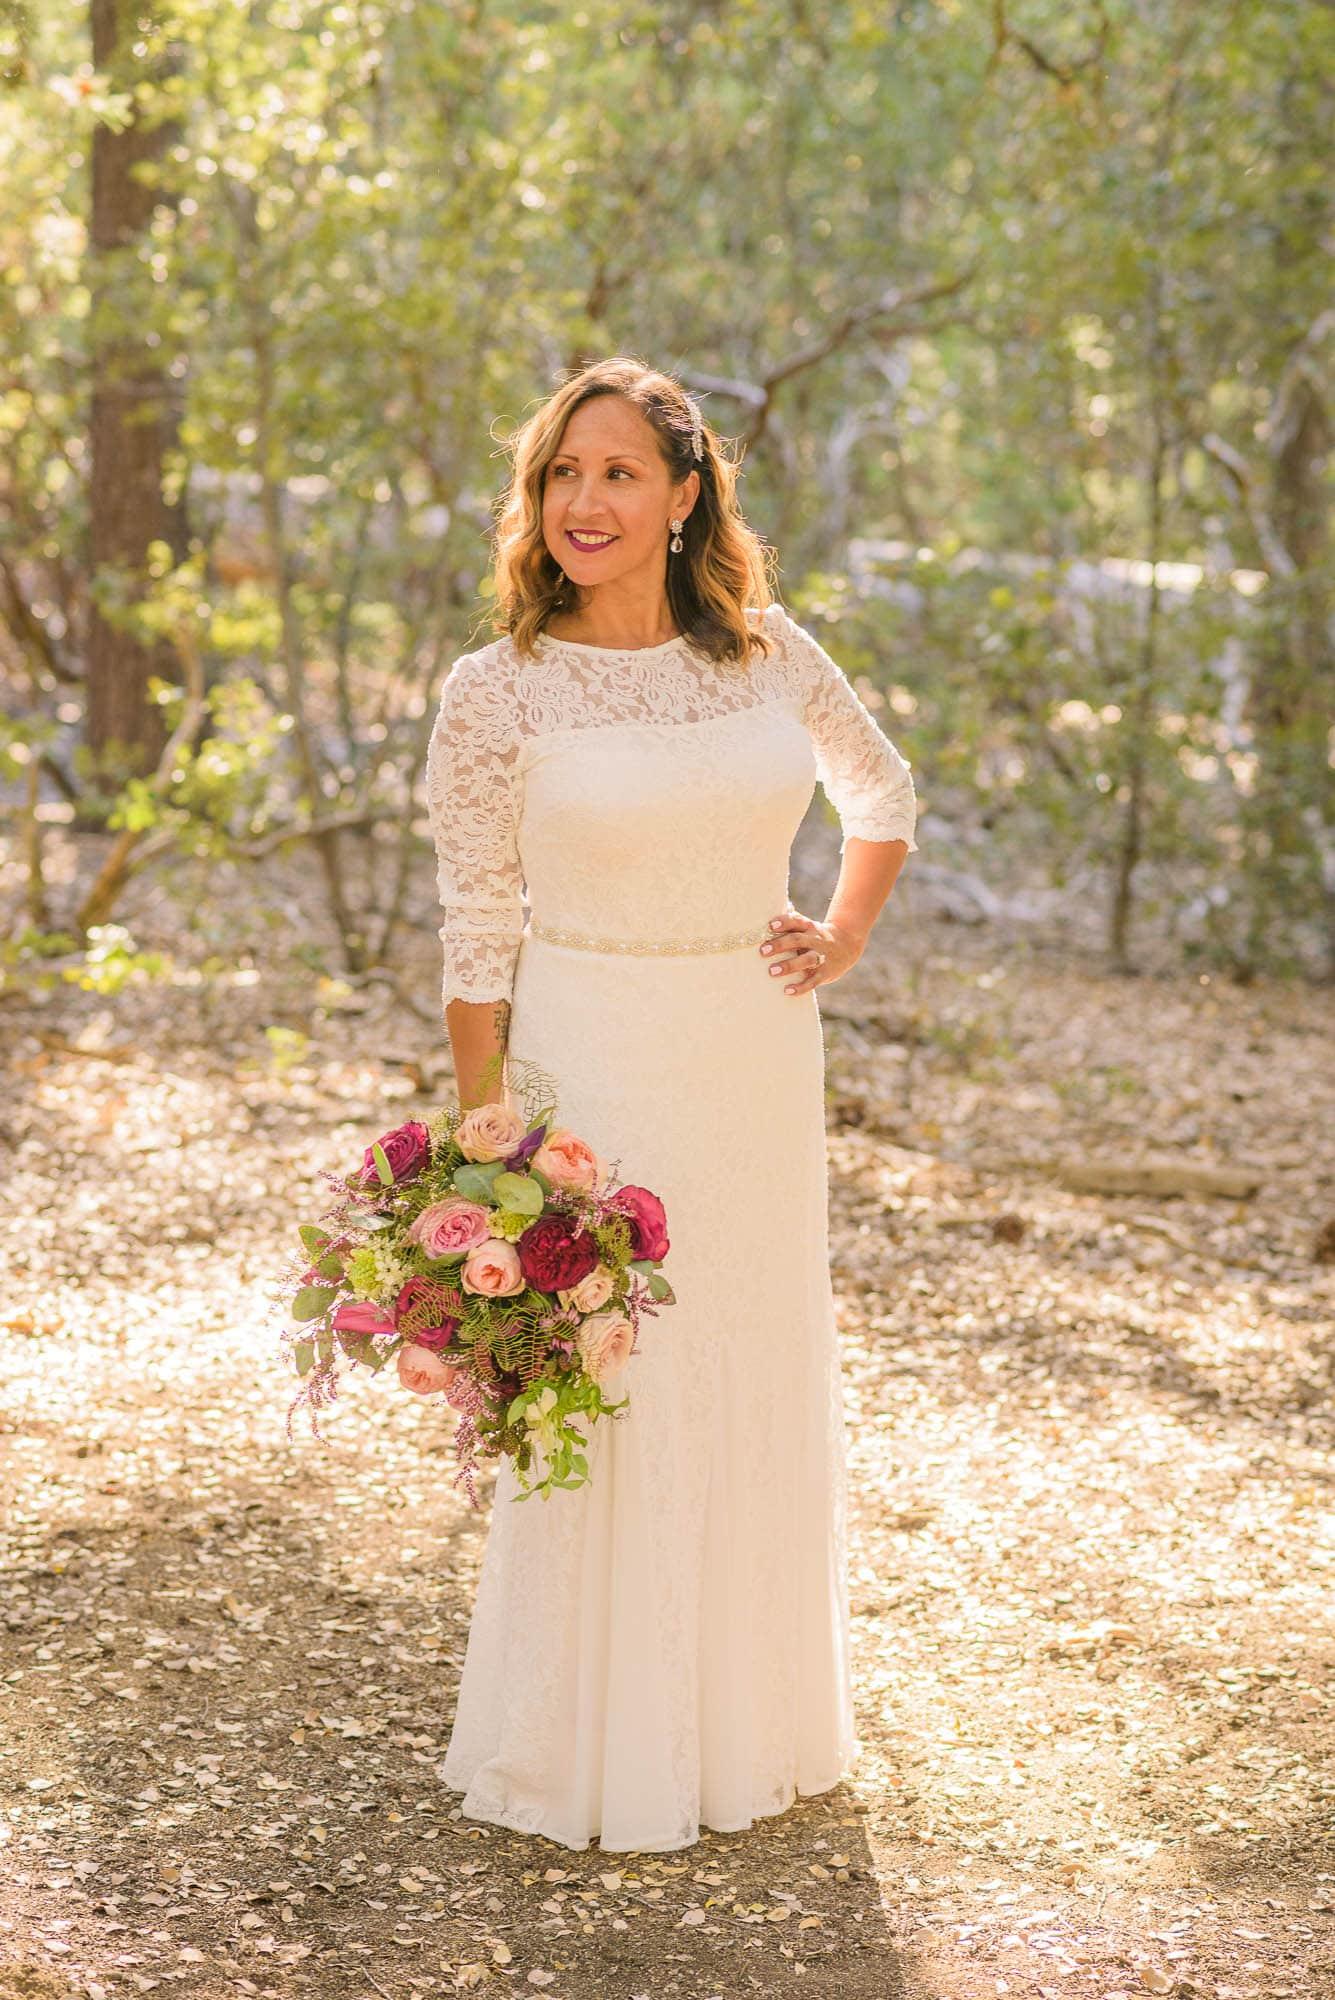 024_Alan_and_Heidi_Wedding_Jackie_Dannon